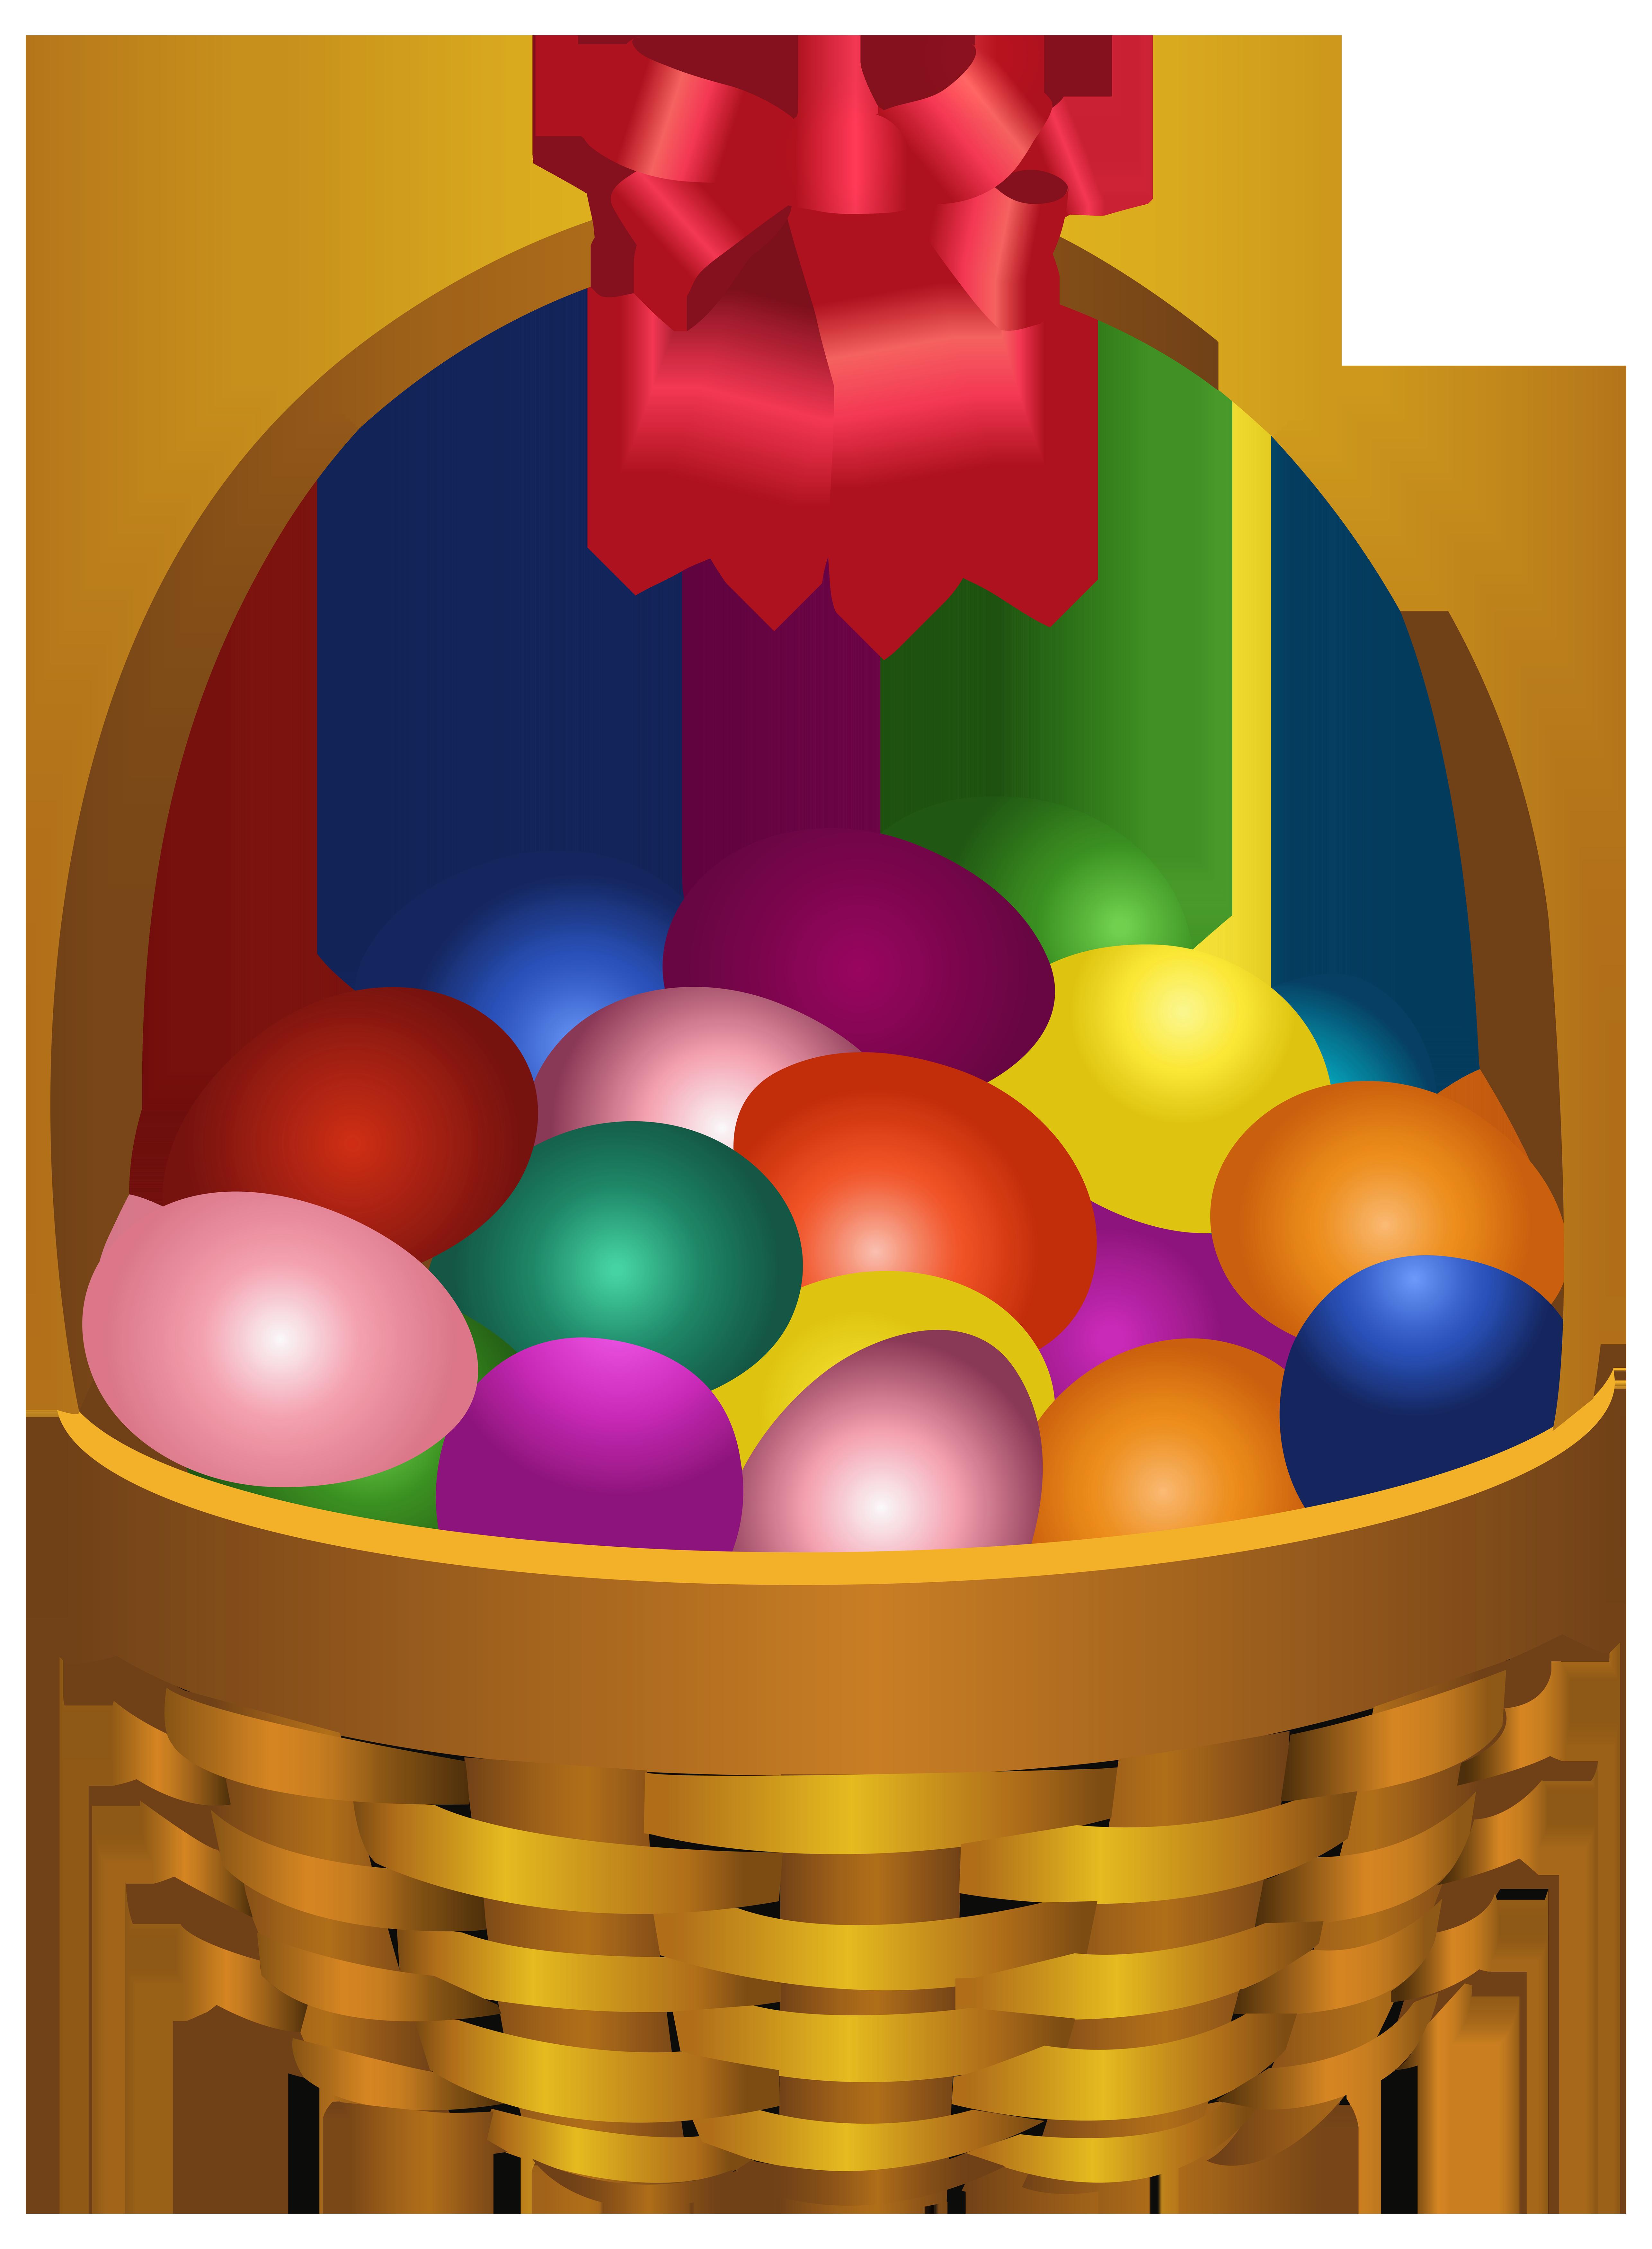 5142x7000 Easter Eggs In Basket Transparent Png Clip Art Imageu200b Gallery